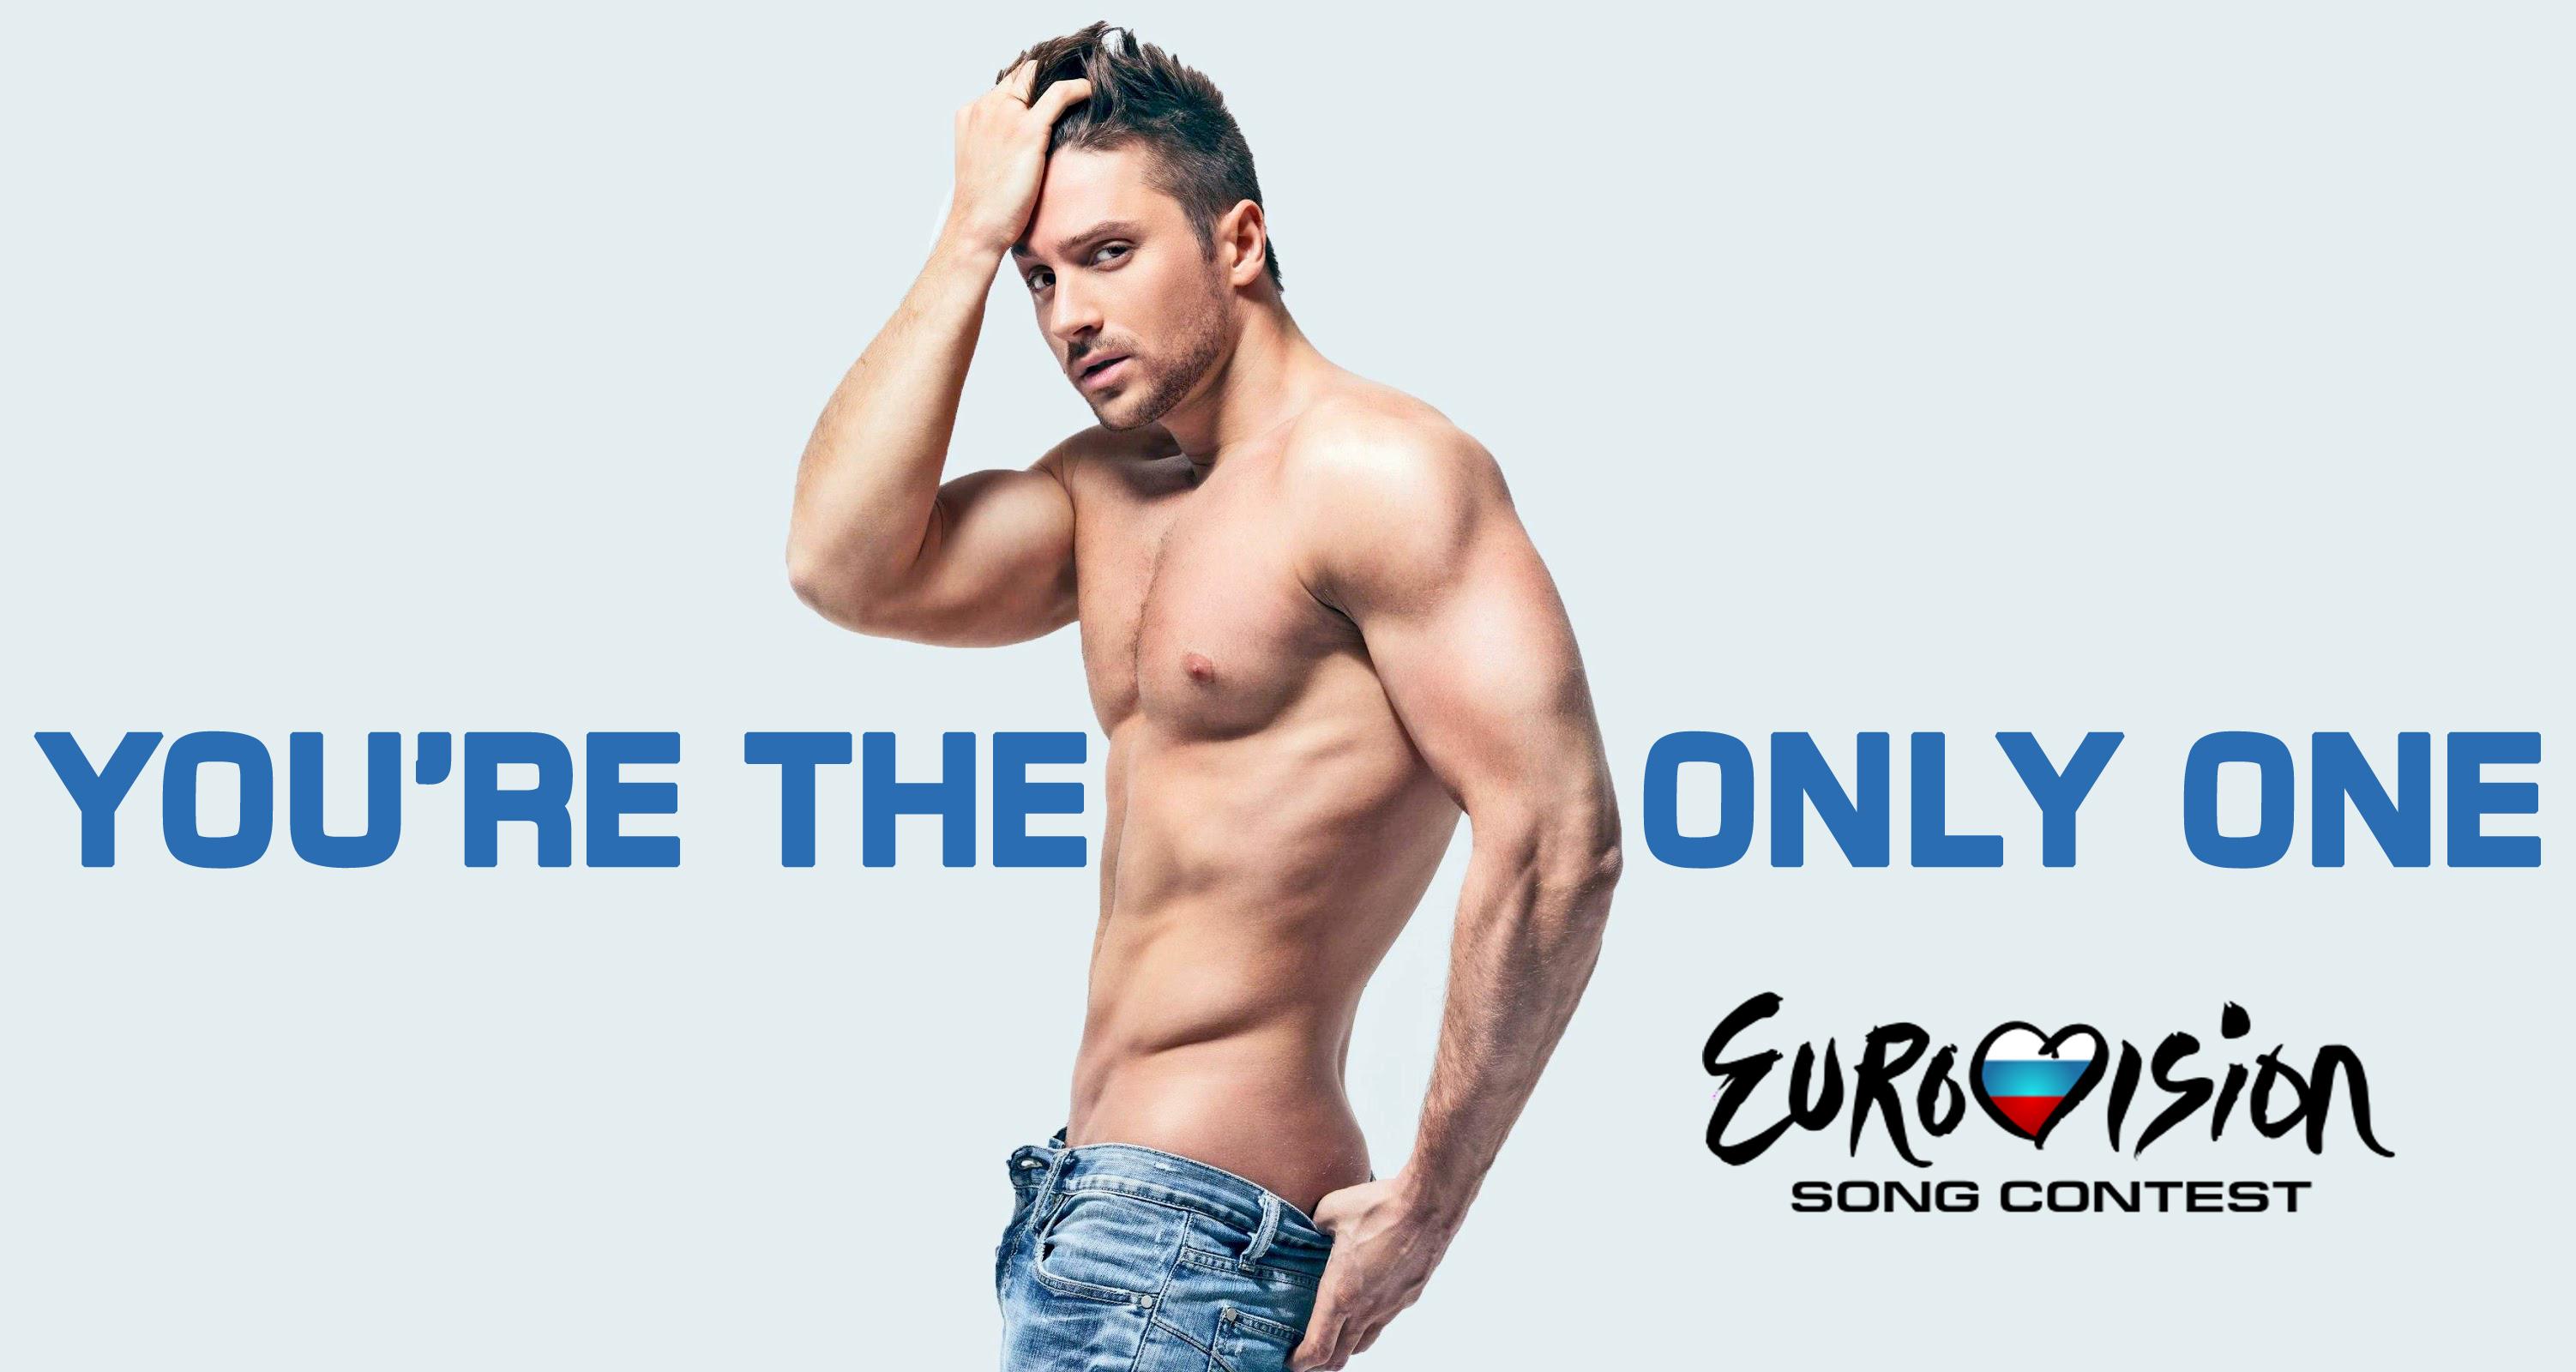 ROAD TO EUROVISION SONG CONTEST 2016: NORVEGIA, POLONIA, RUSSIA, SAN MARINO, SERBIA, SLOVENIA